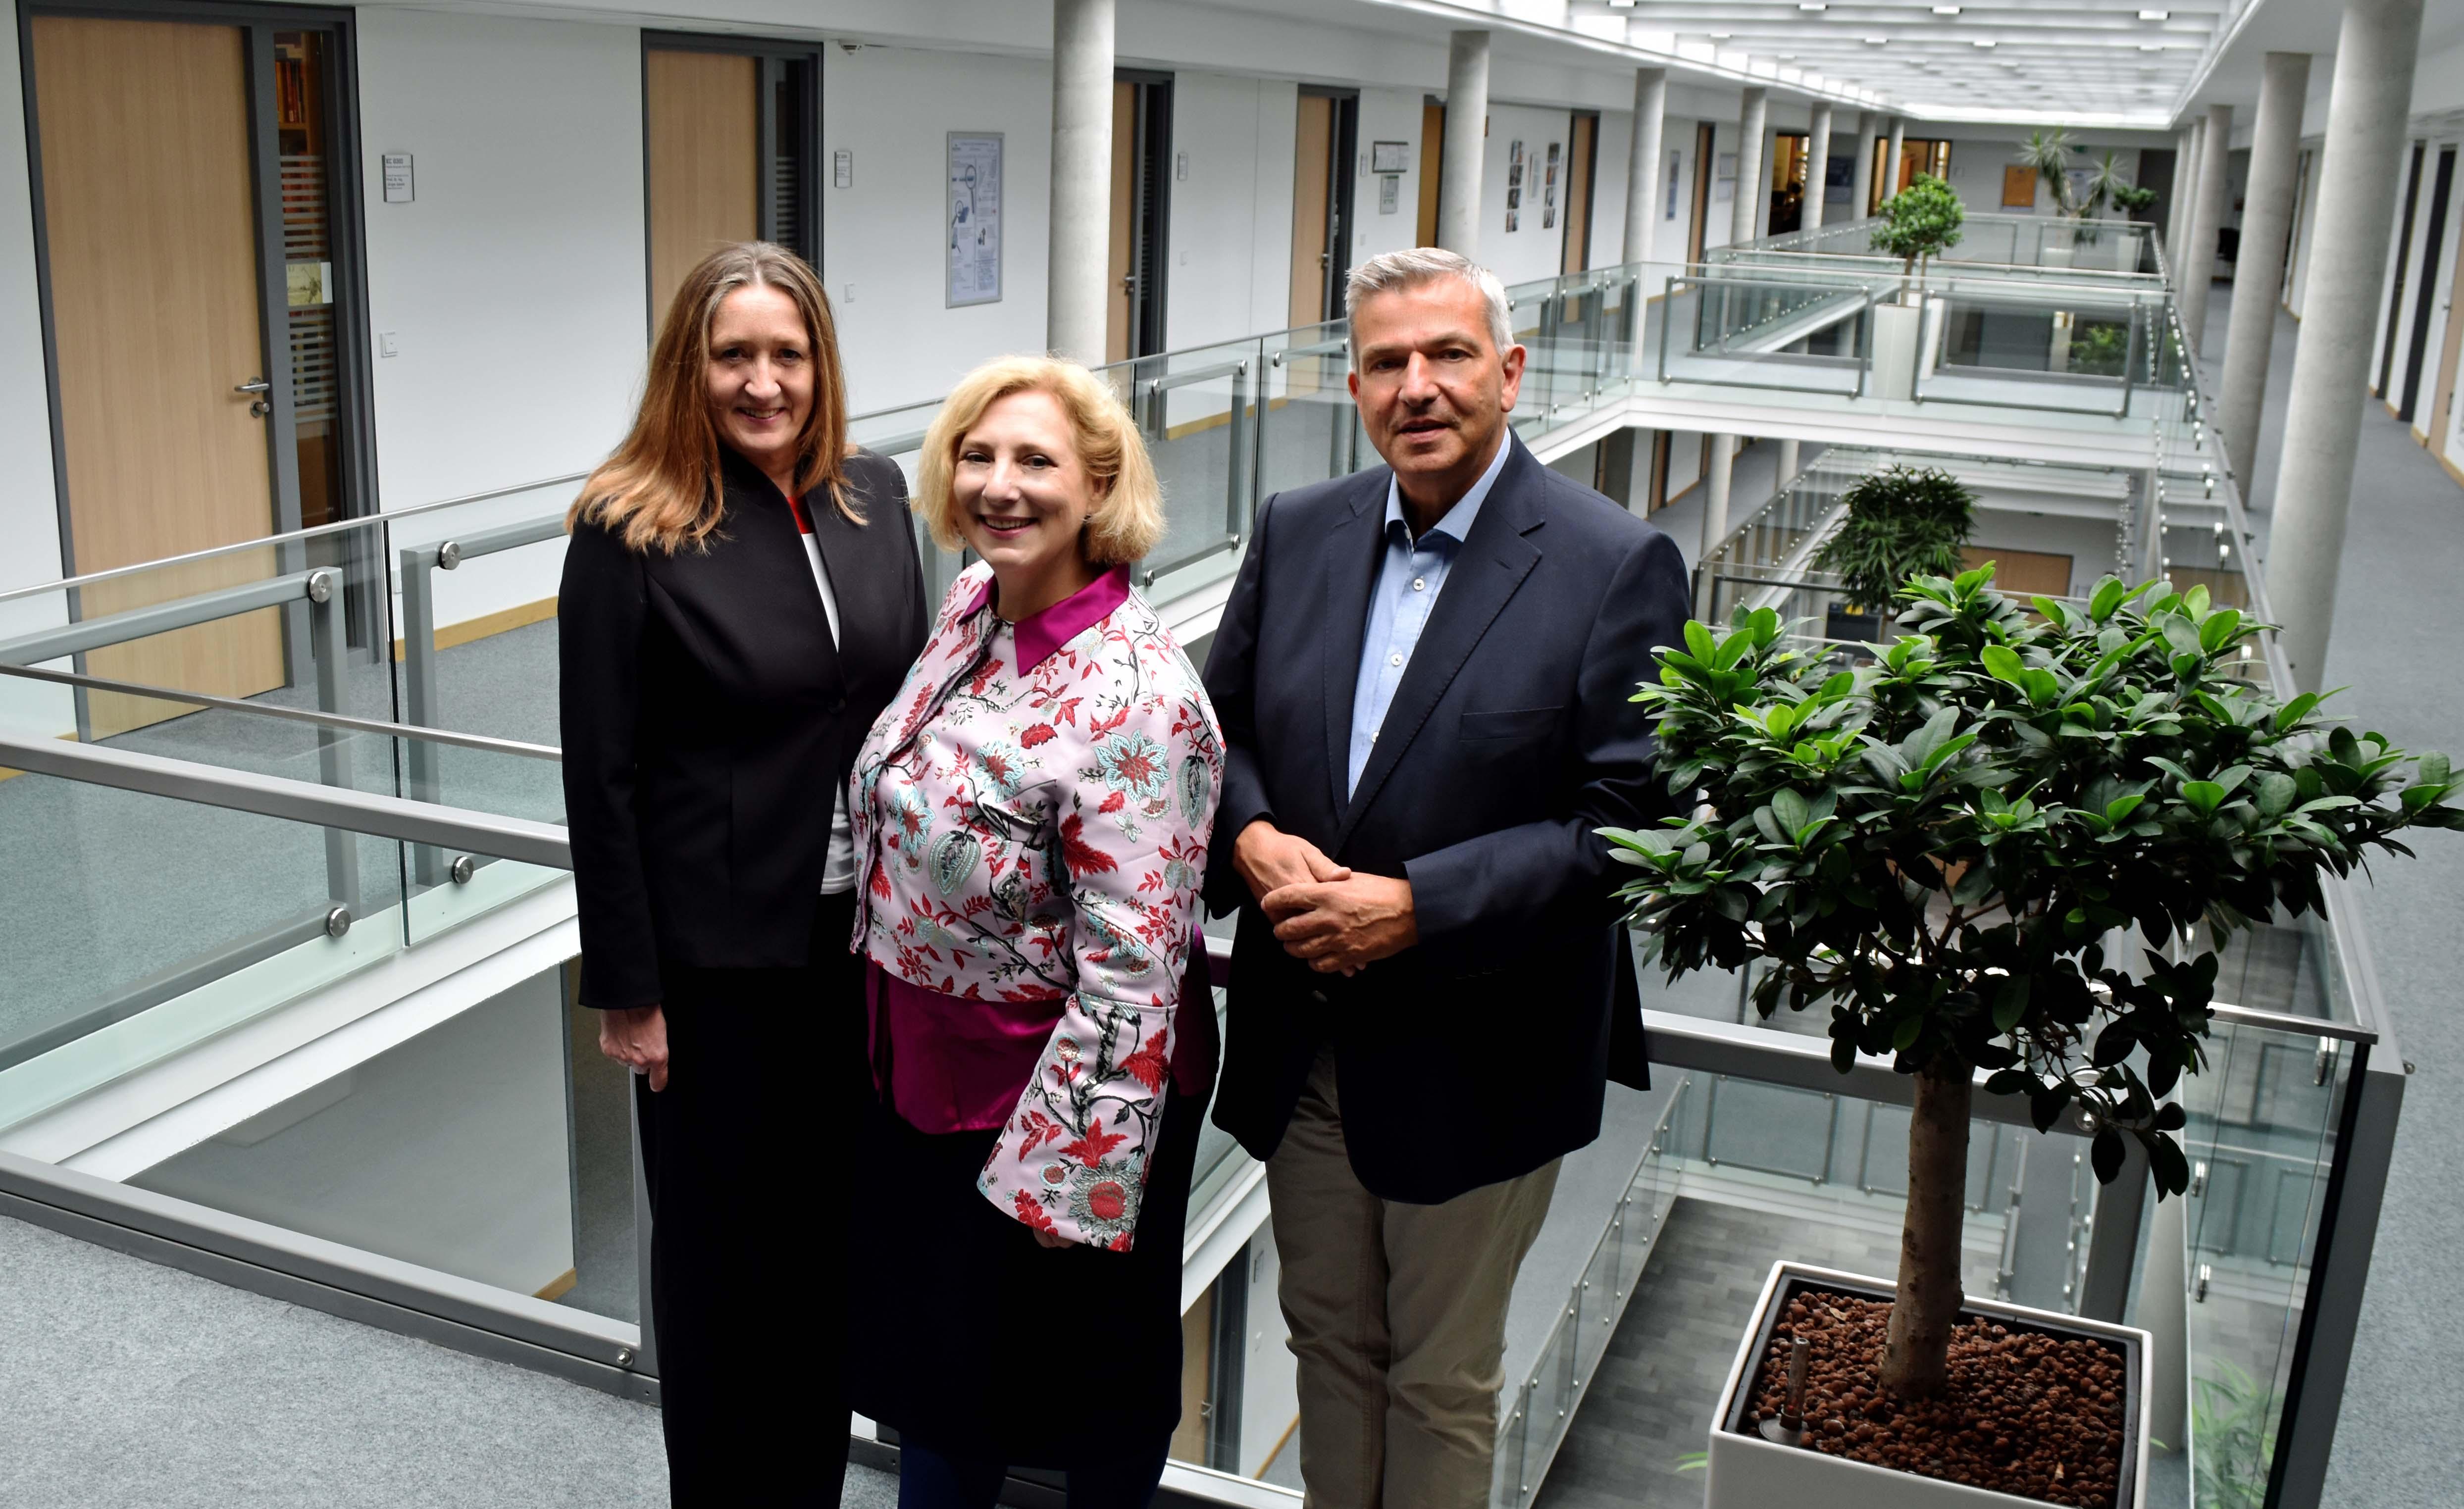 V.l.n.r.: Dr. Gabriele Andretta, Dr. Daniela De Ridder und Professor Dr. Steinkamp